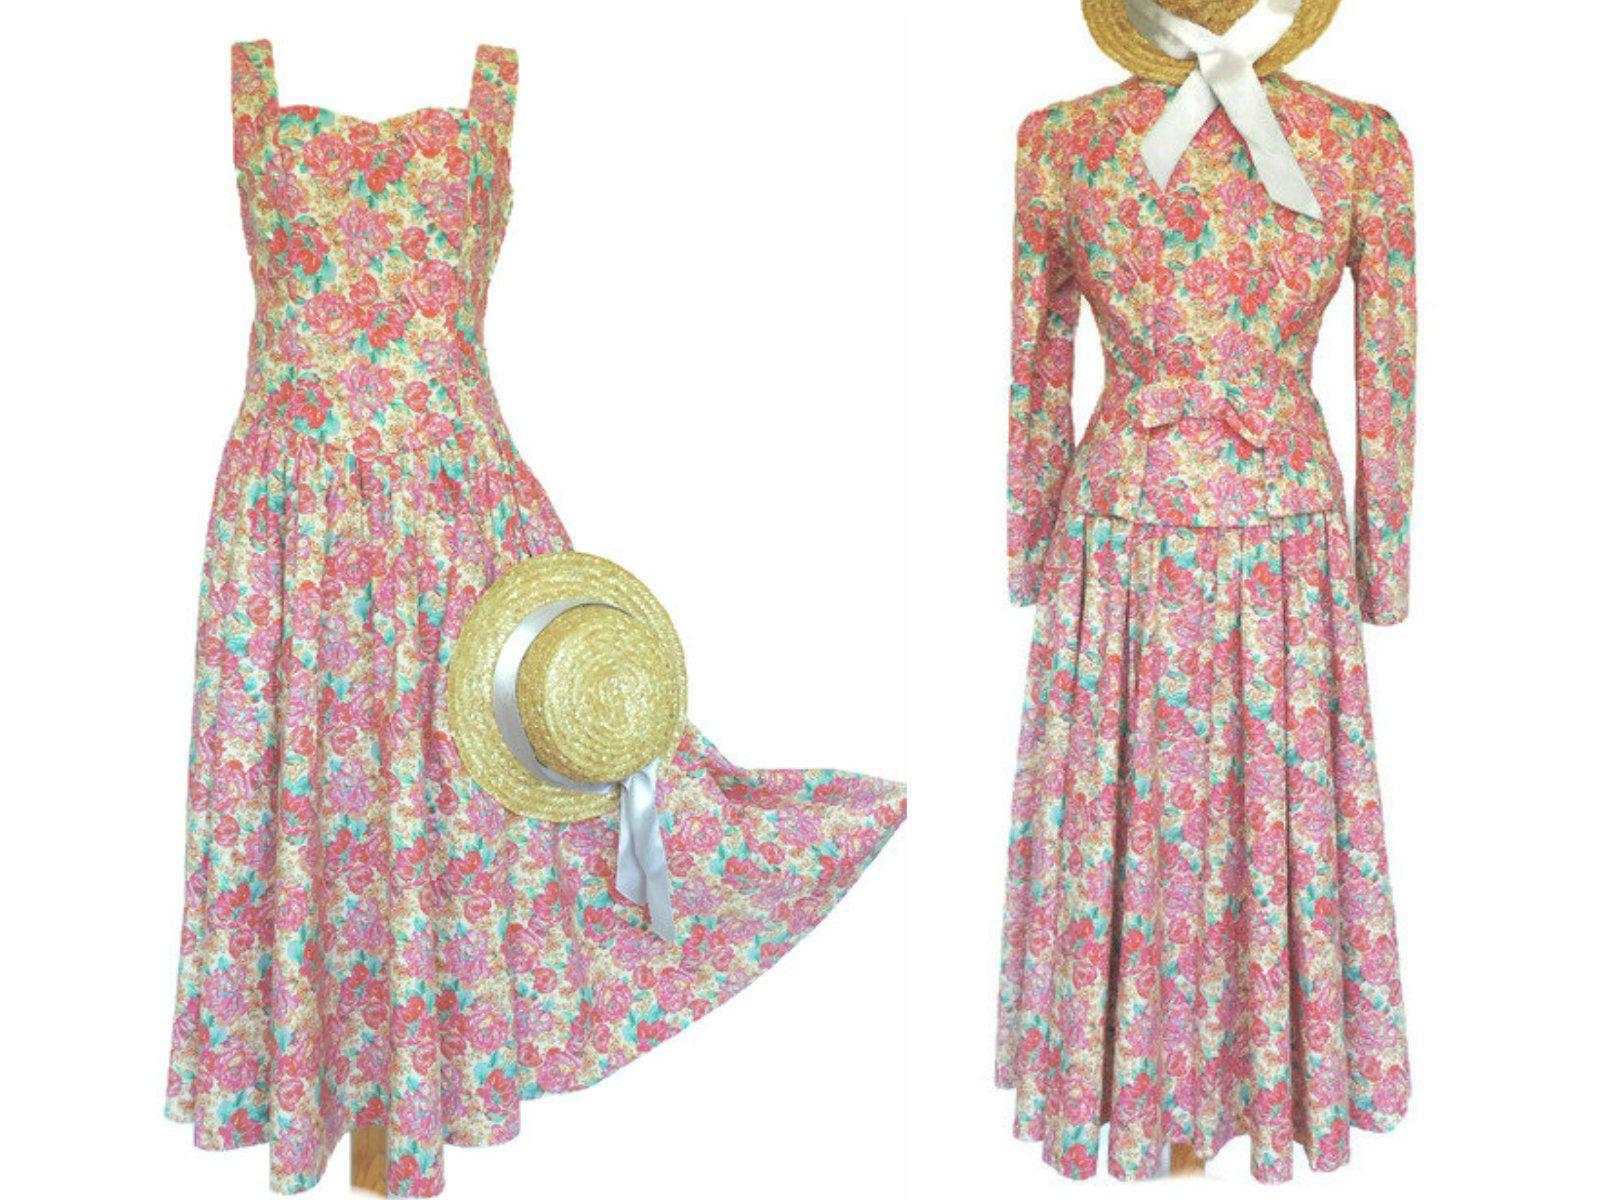 80s Laura Ashley Pink Floral Cotton Dress Jacket Vintage Prairie Summer 2 Piece Outfit Uk 10 Floral Cotton Dress Printed Cotton Dress Vintage Fashion